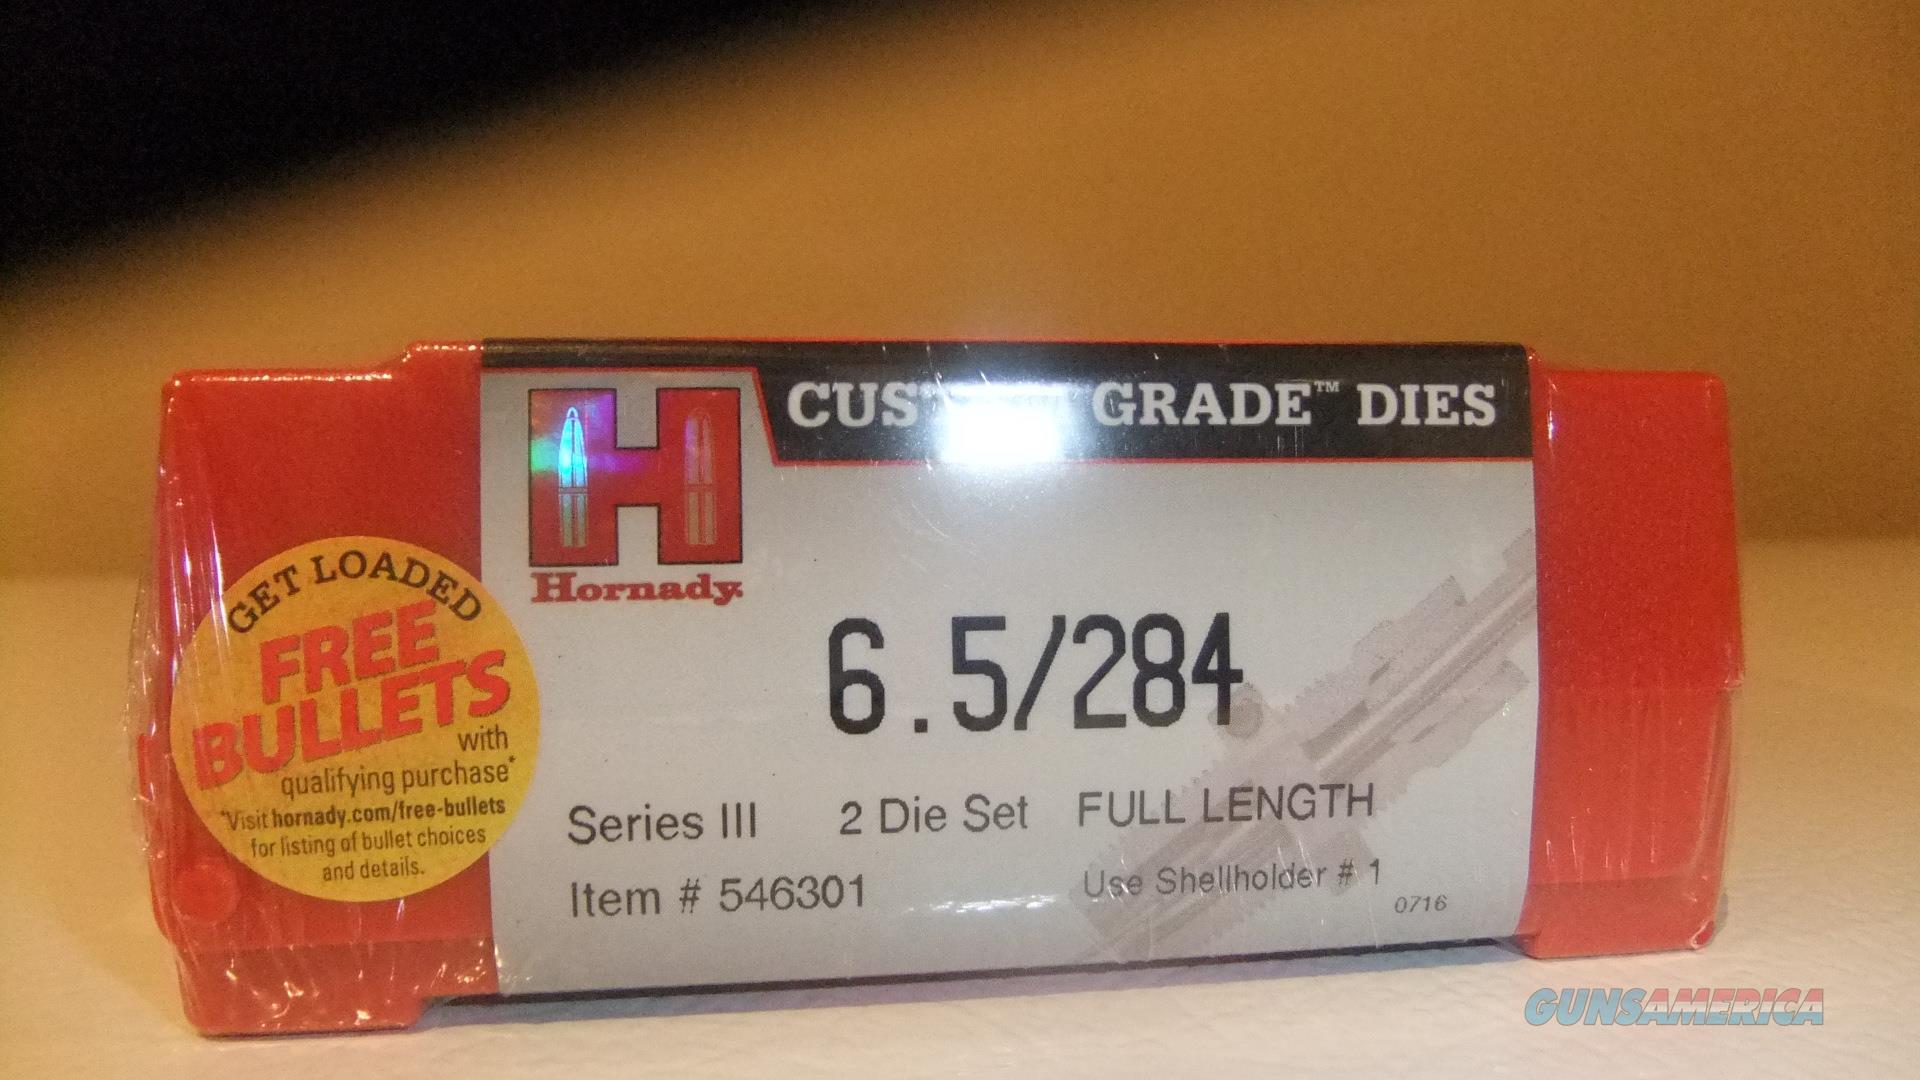 Hornady 6.5x284 Norma Custom Grade Dies  Non-Guns > Reloading > Equipment > Metallic > Dies